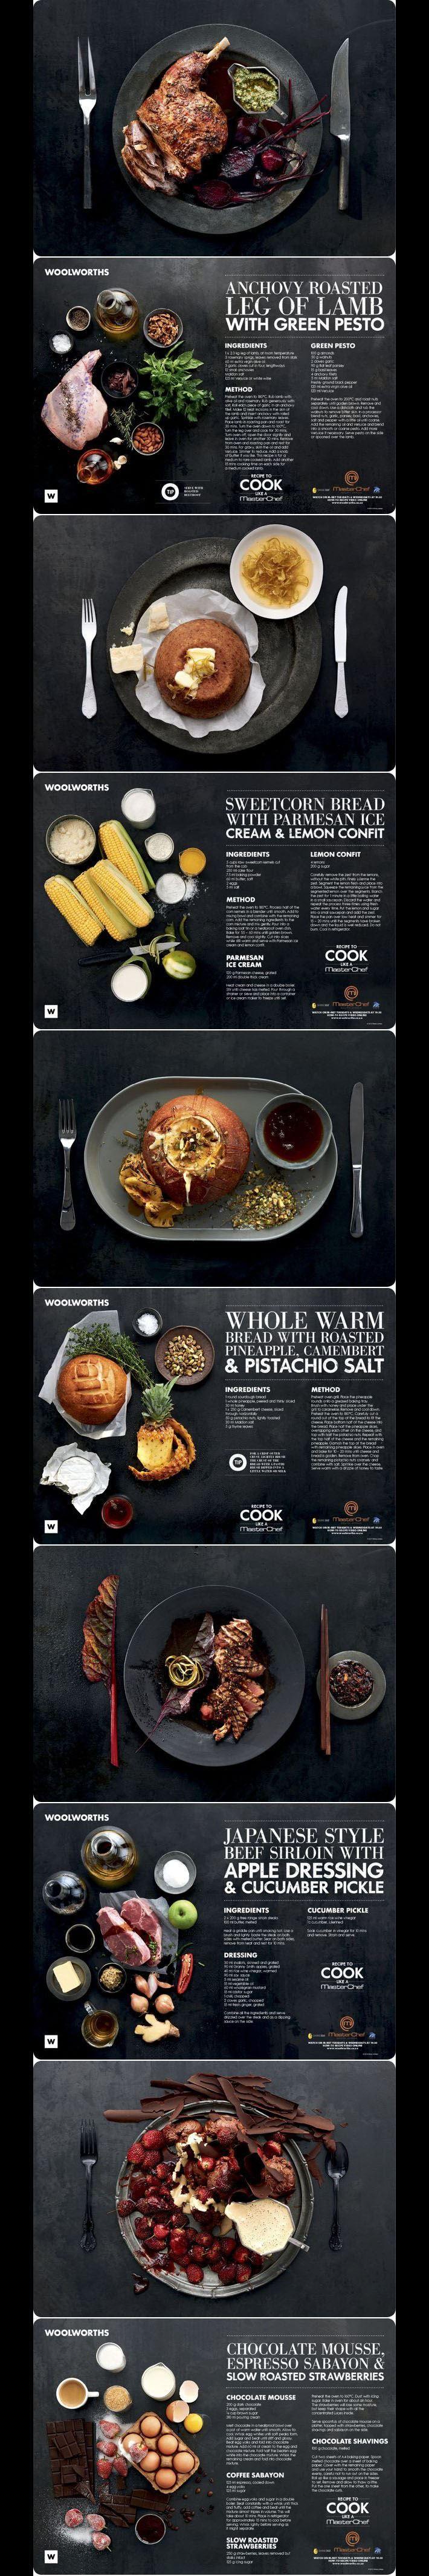 Clean-Food-Web-Design-Inspiration-2015